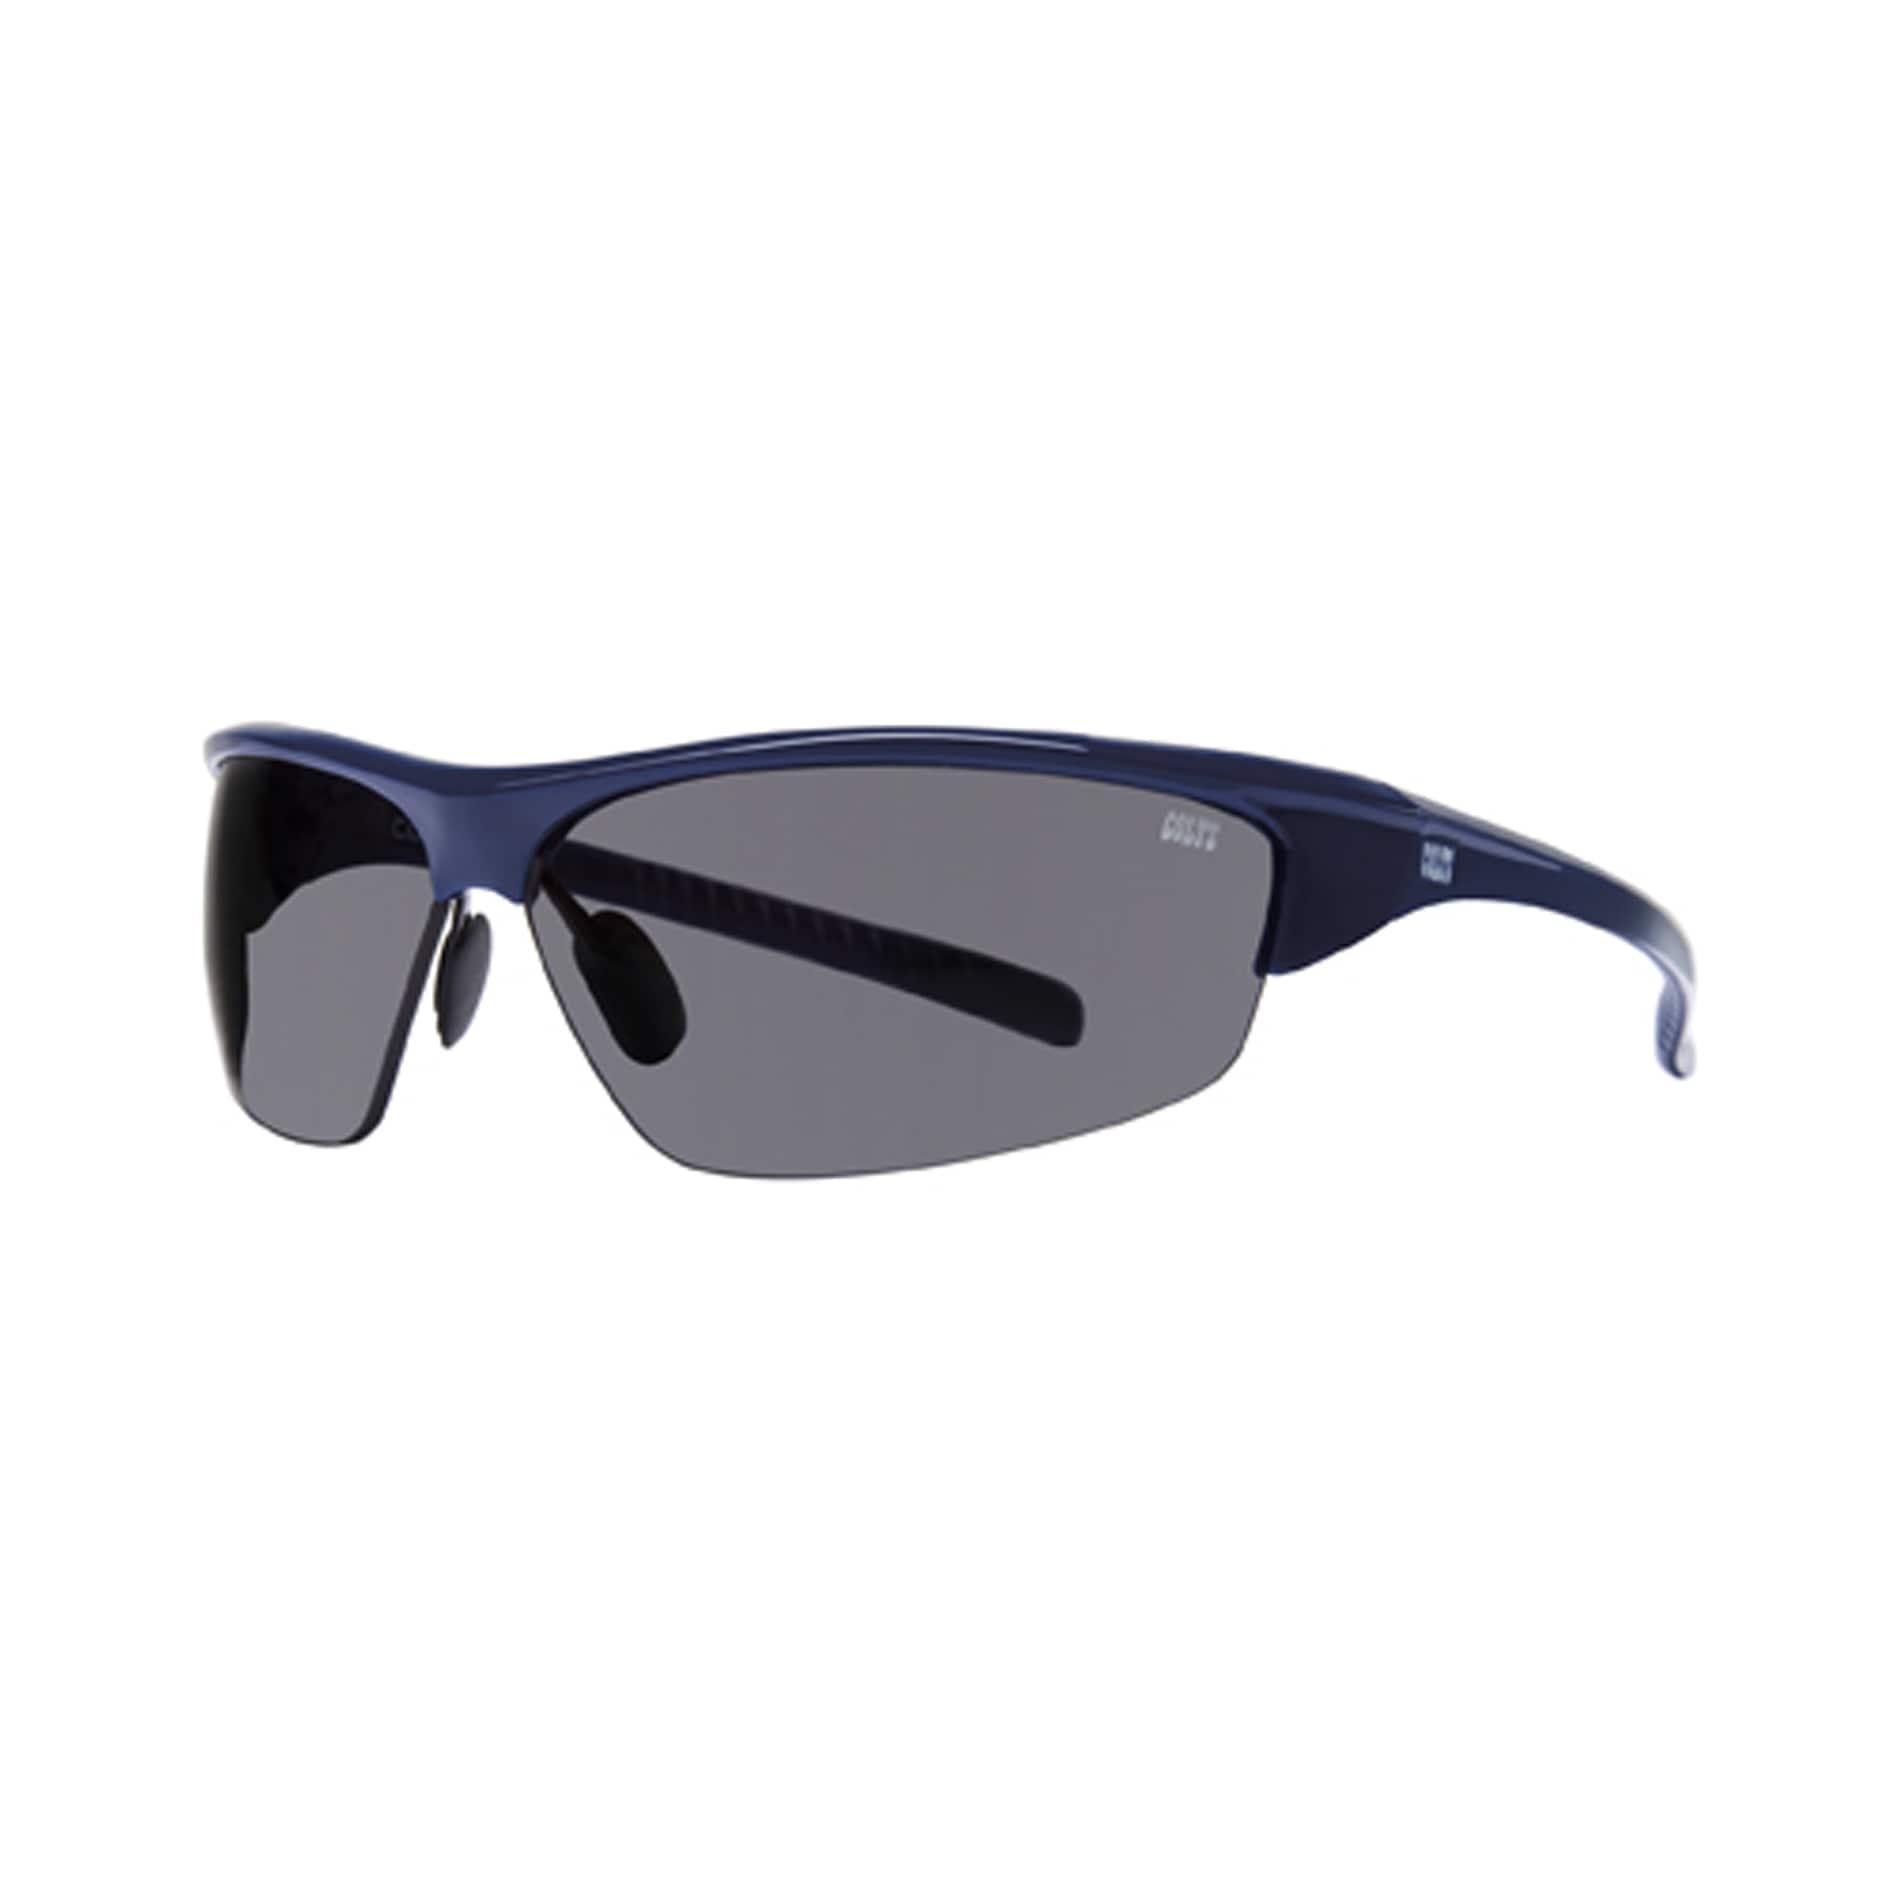 Modo Indianapolis Colts Men's 'Impact' Sunglasses